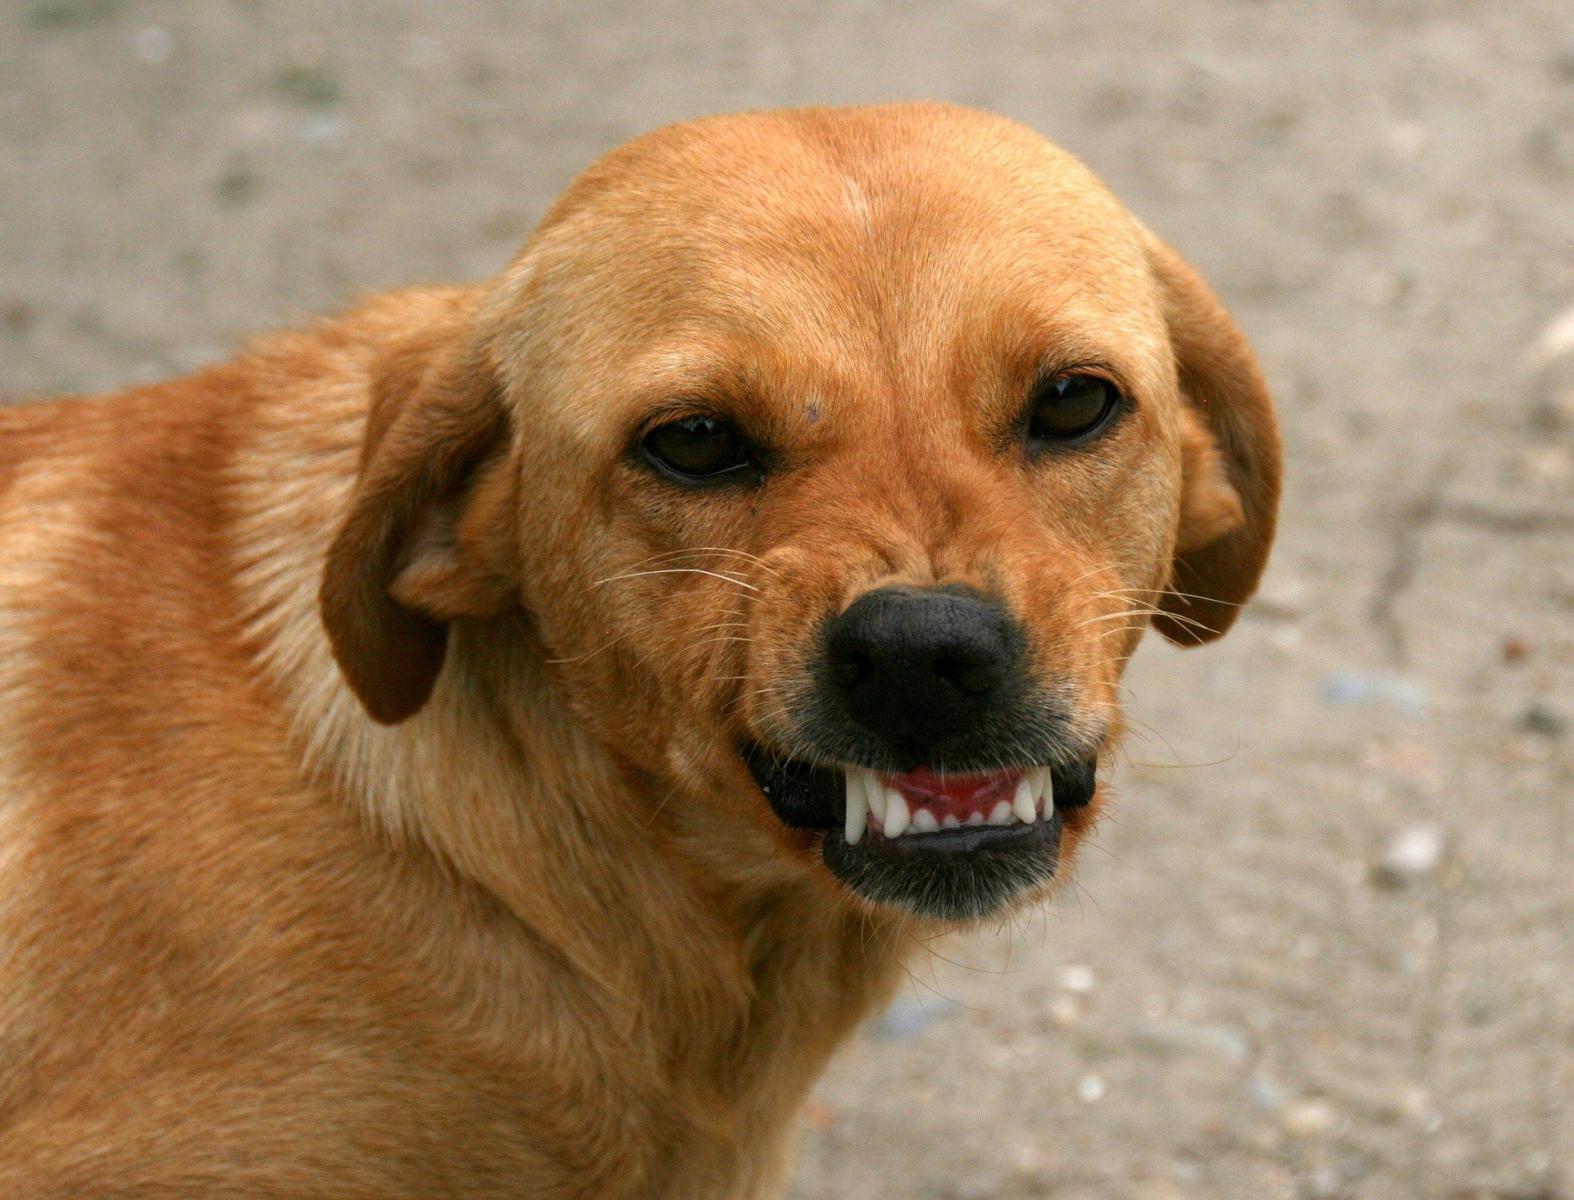 В Брянске на улице Медведева собаки прокусили ногу женщине